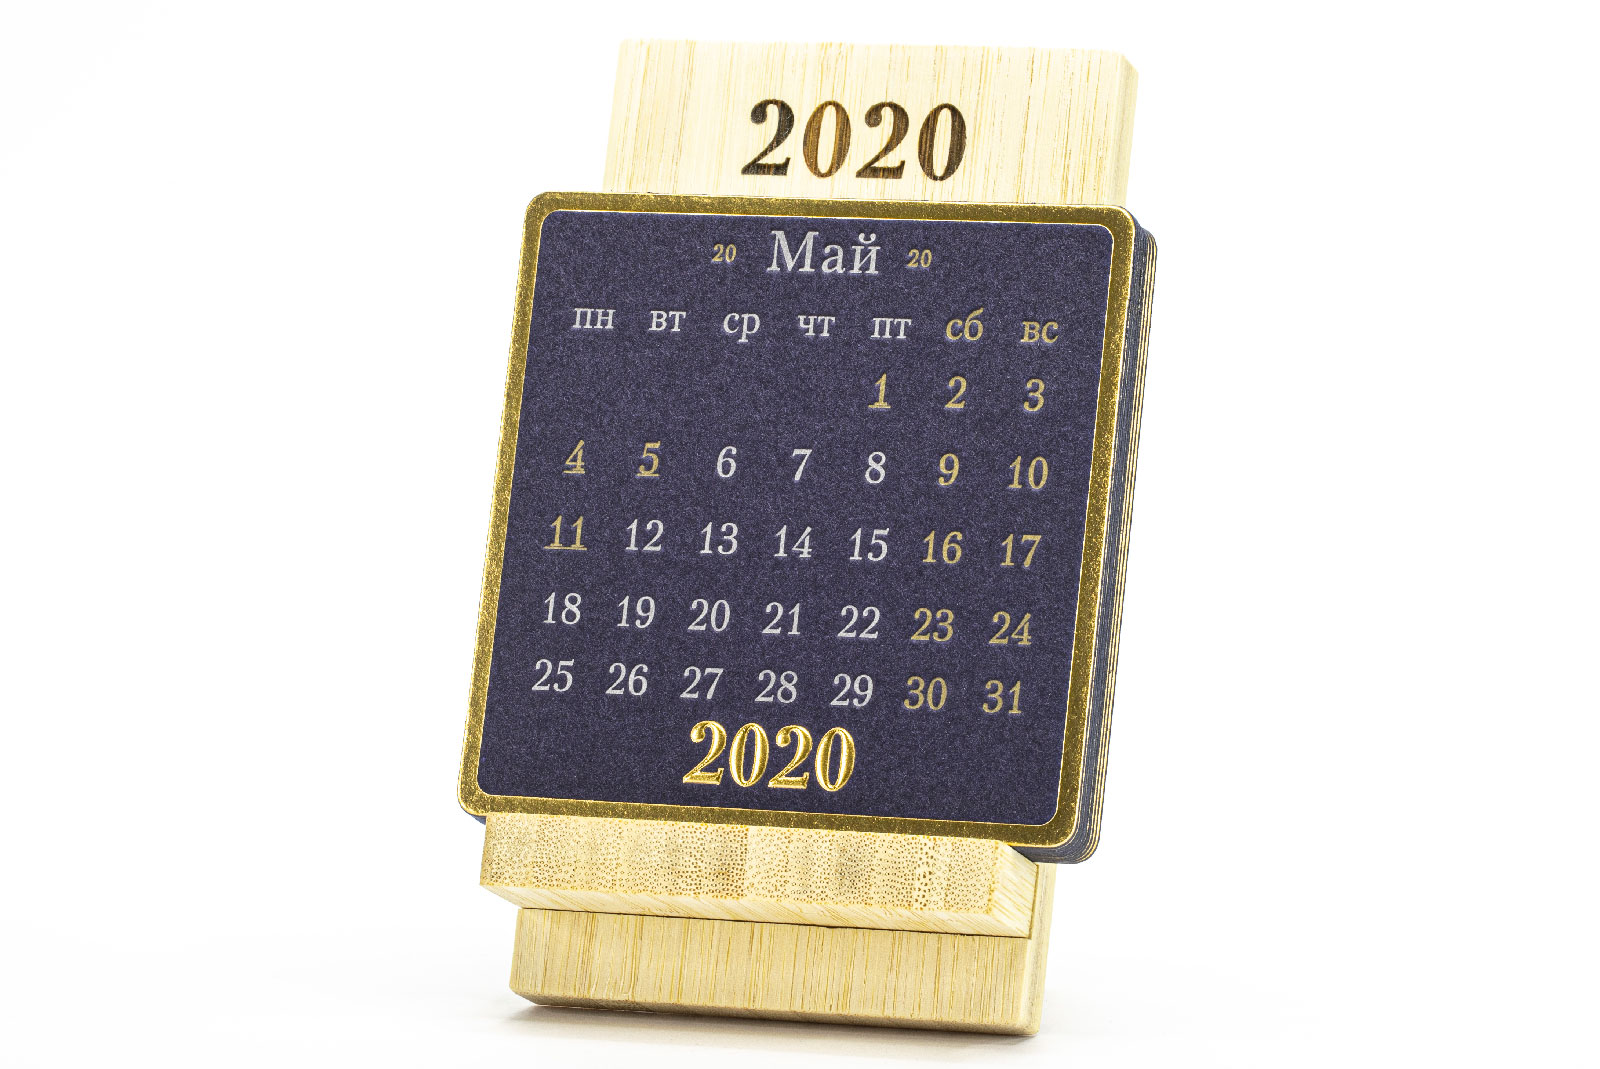 Календарь 2020 год на подставке из бамбука iSTAND